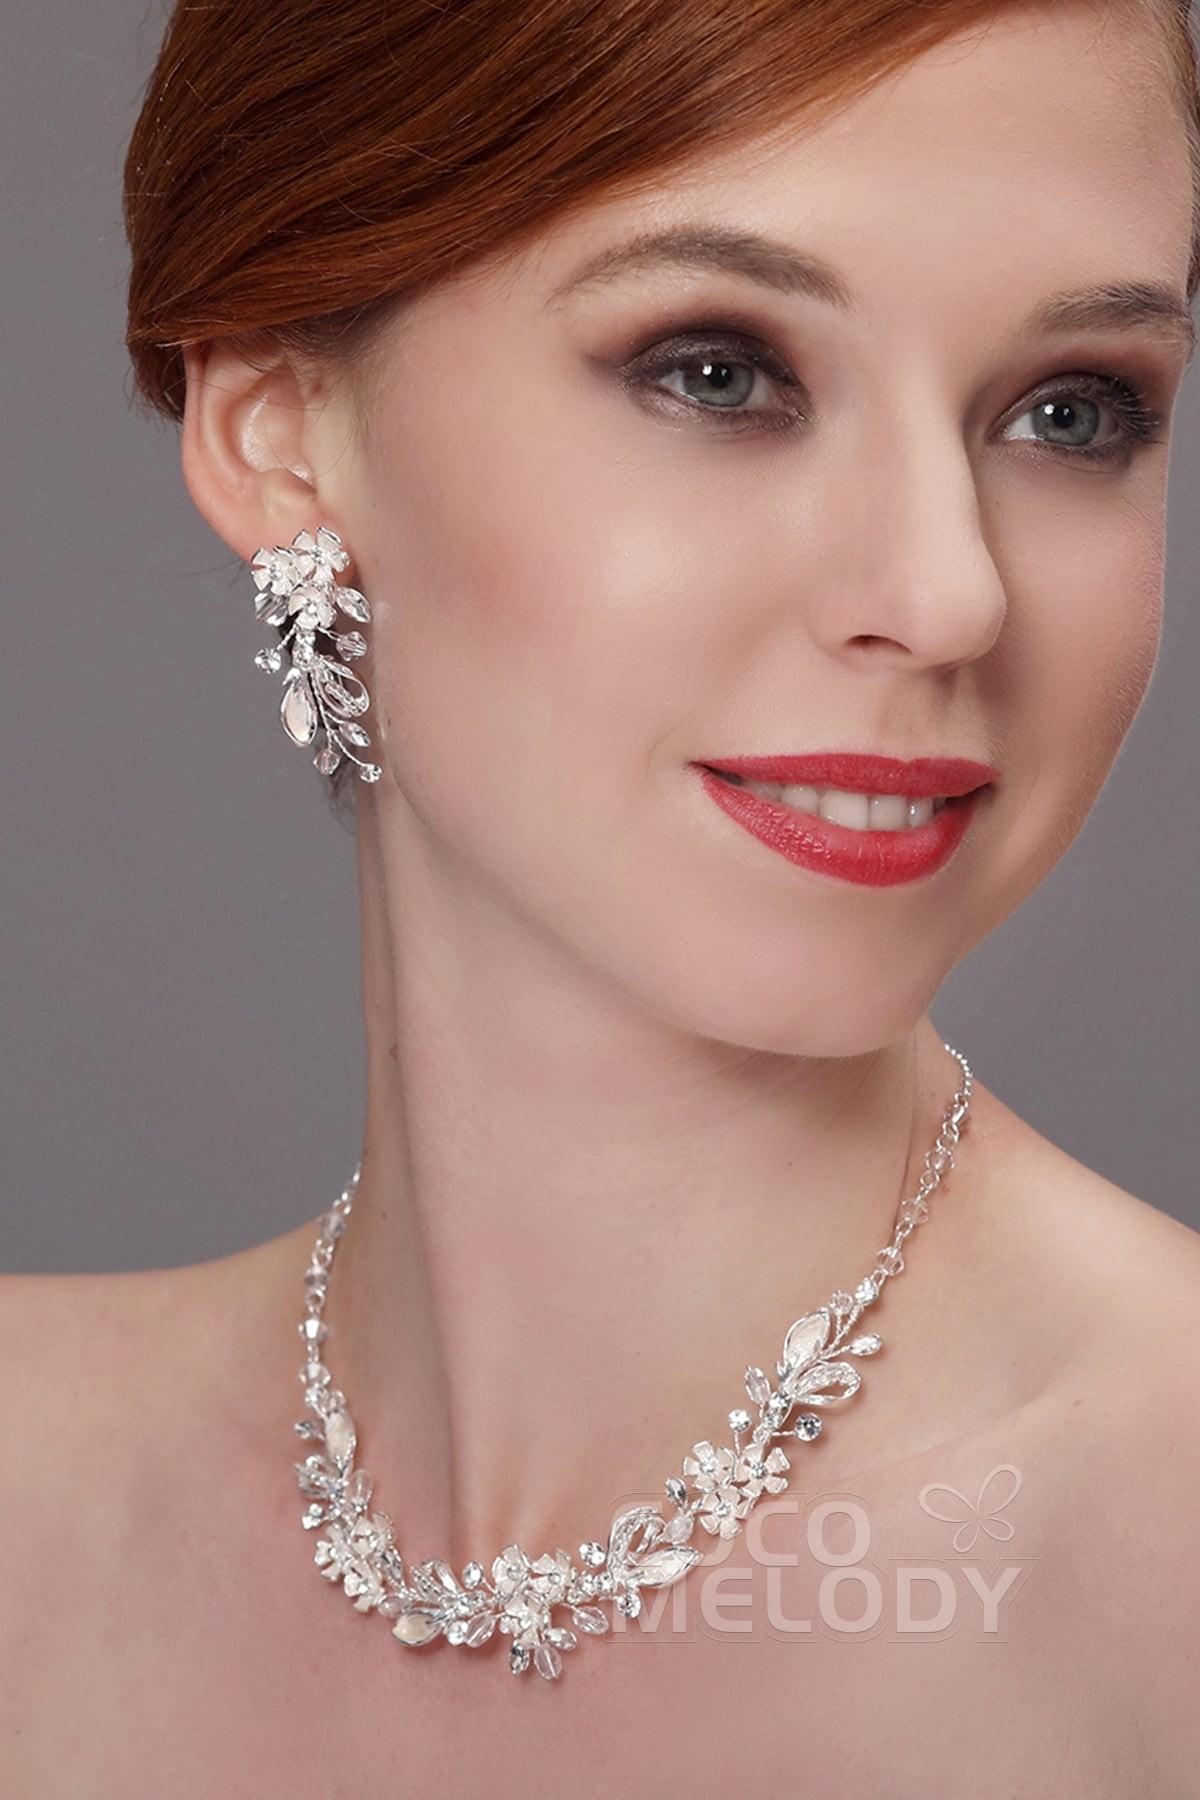 Impressive Silver Cloud Zircon Wedding Necklace and Earrings Jewelry ...